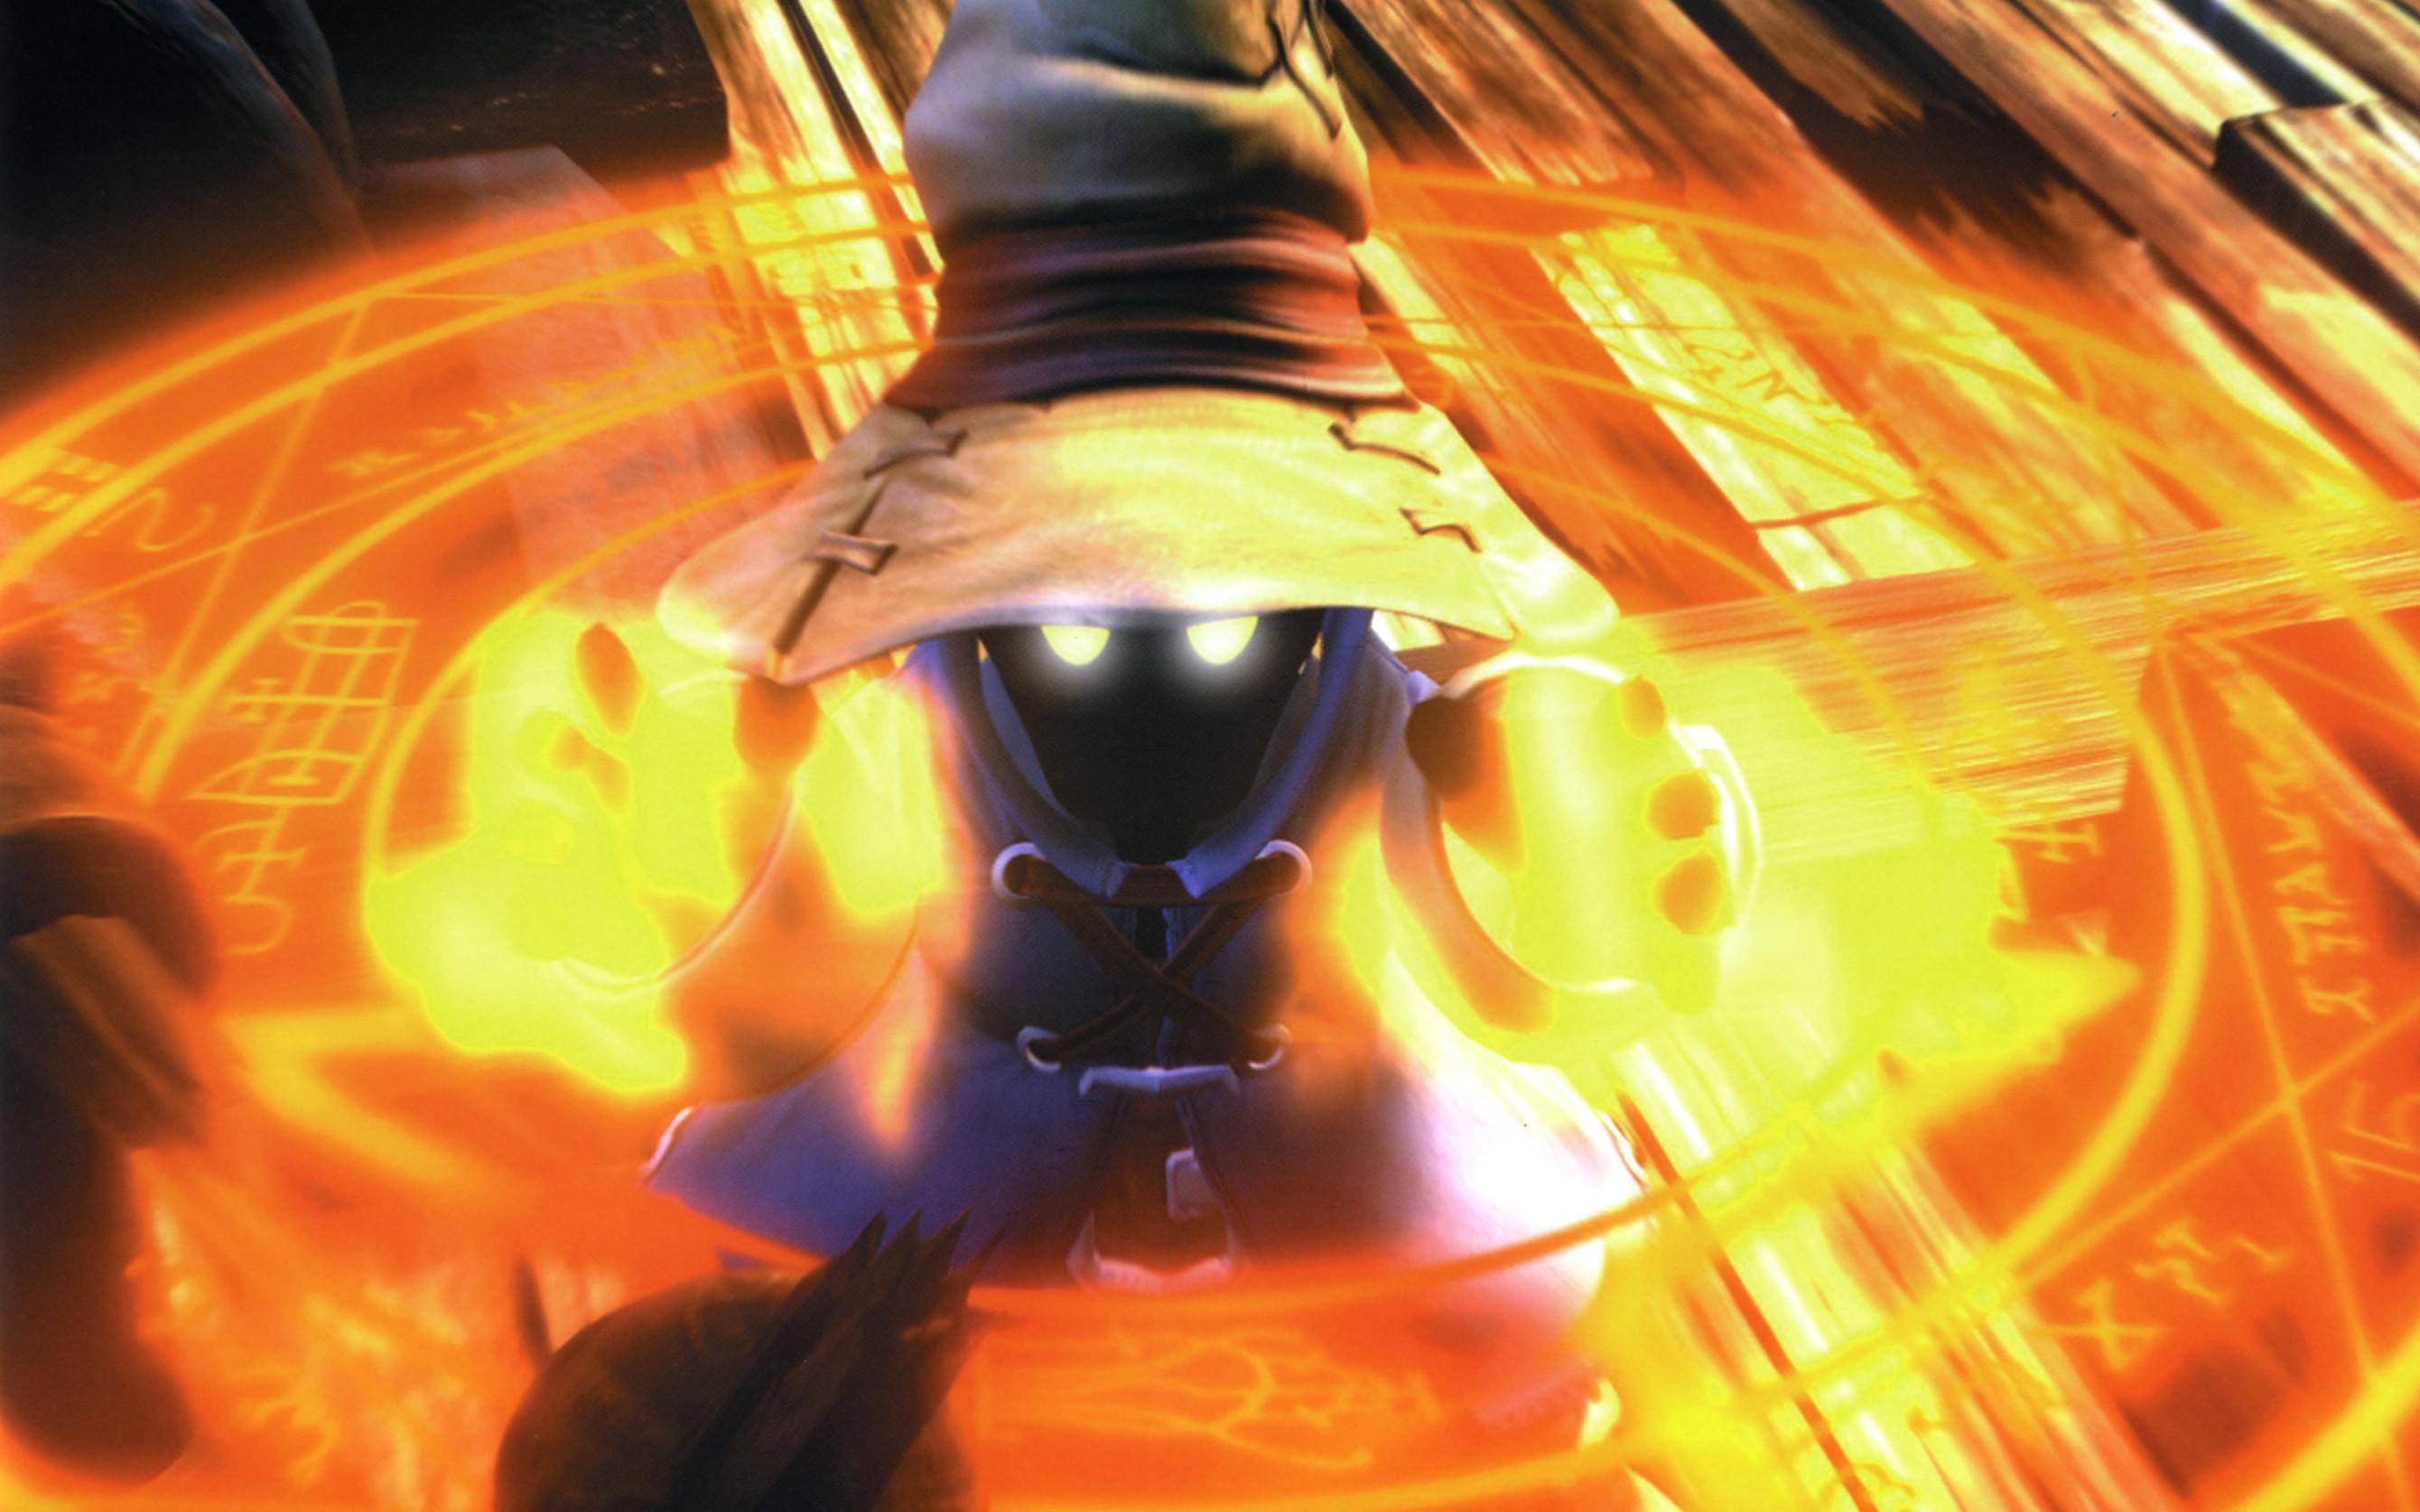 … Final Fantasy, mage, video games, black, Vivi (Final Fantasy IX) …